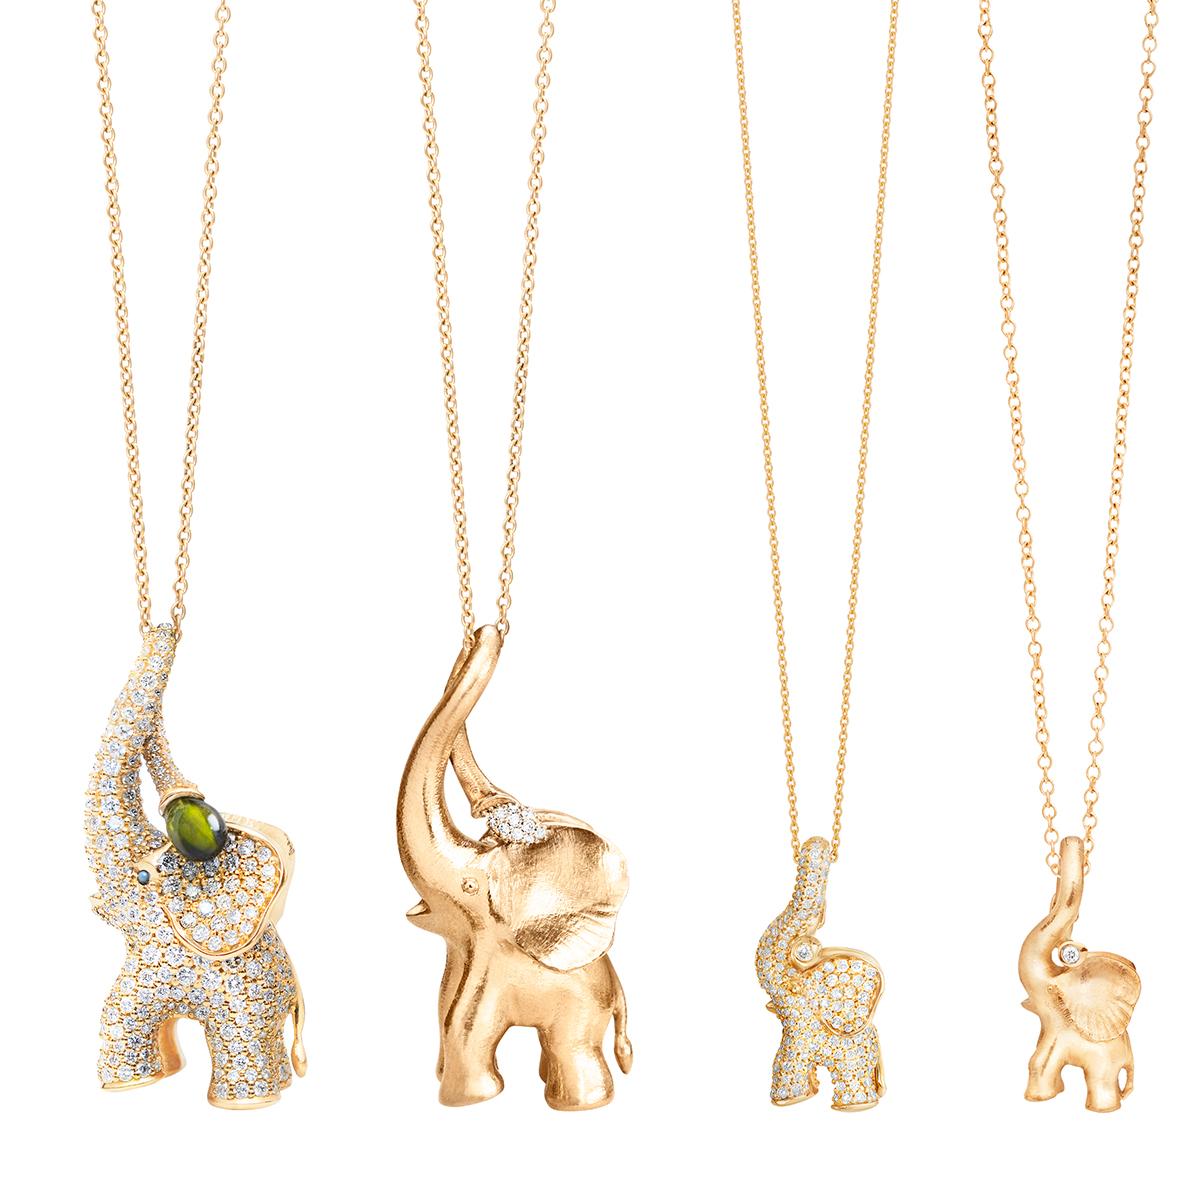 OLC_Collection_Elephant_2.jpg